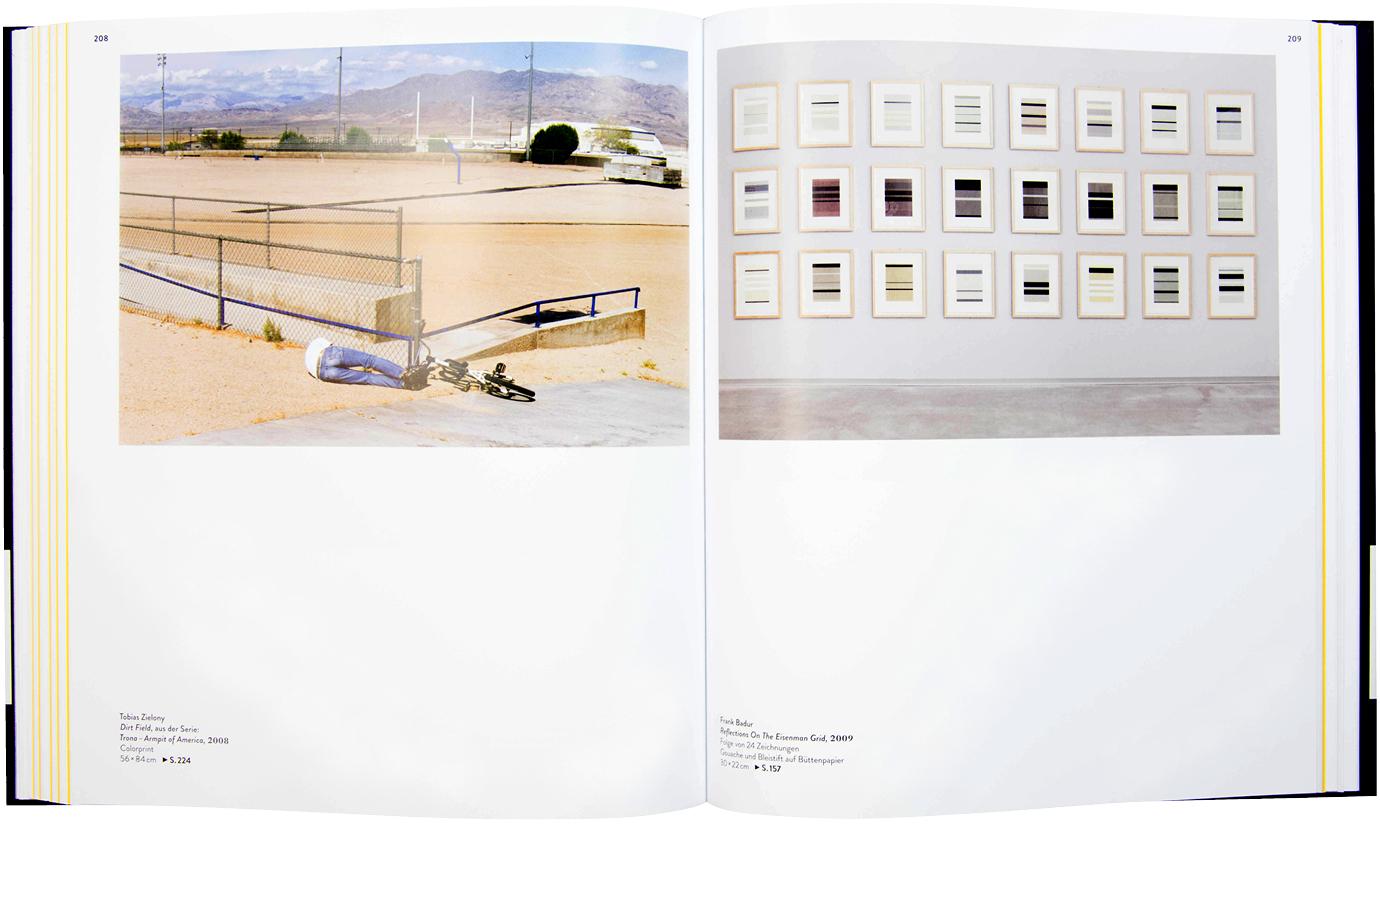 http://e-o-t.de/wordpress/wp-content/uploads/2017/06/2015_eot-BG-Jubilaeum-Book-16.jpg